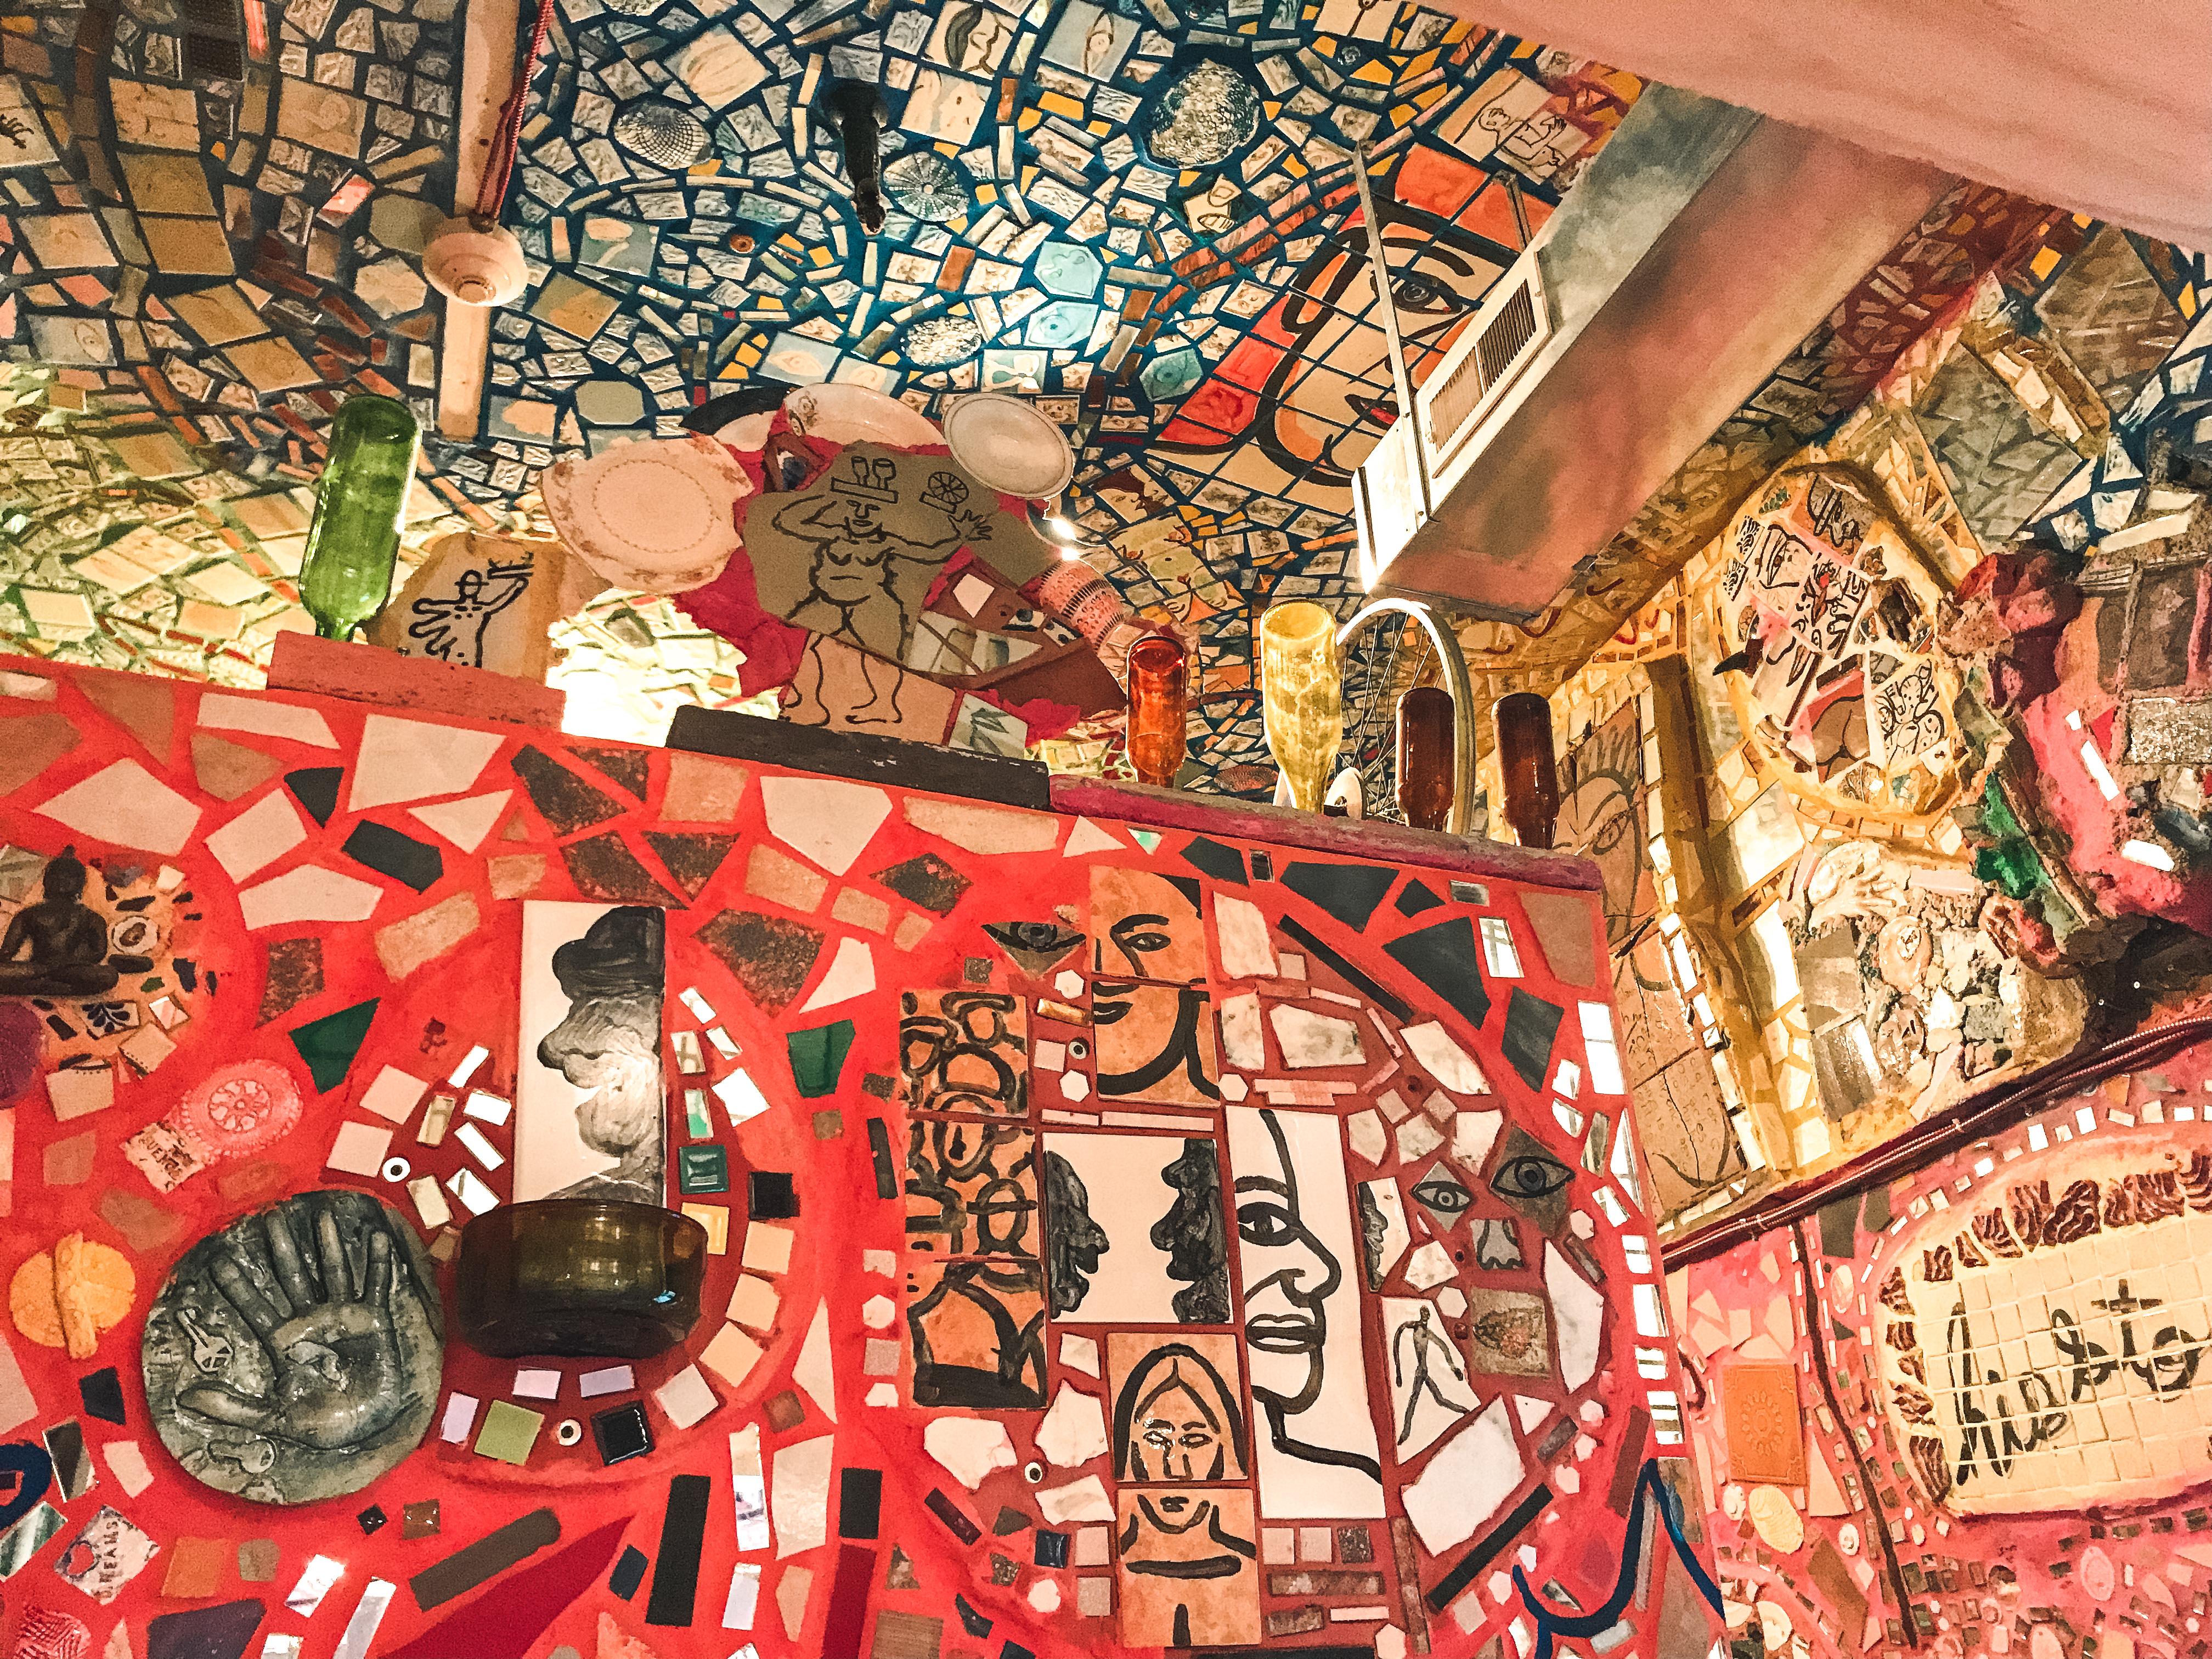 Visit Philly trip - Philadelphia's Magic Gardens